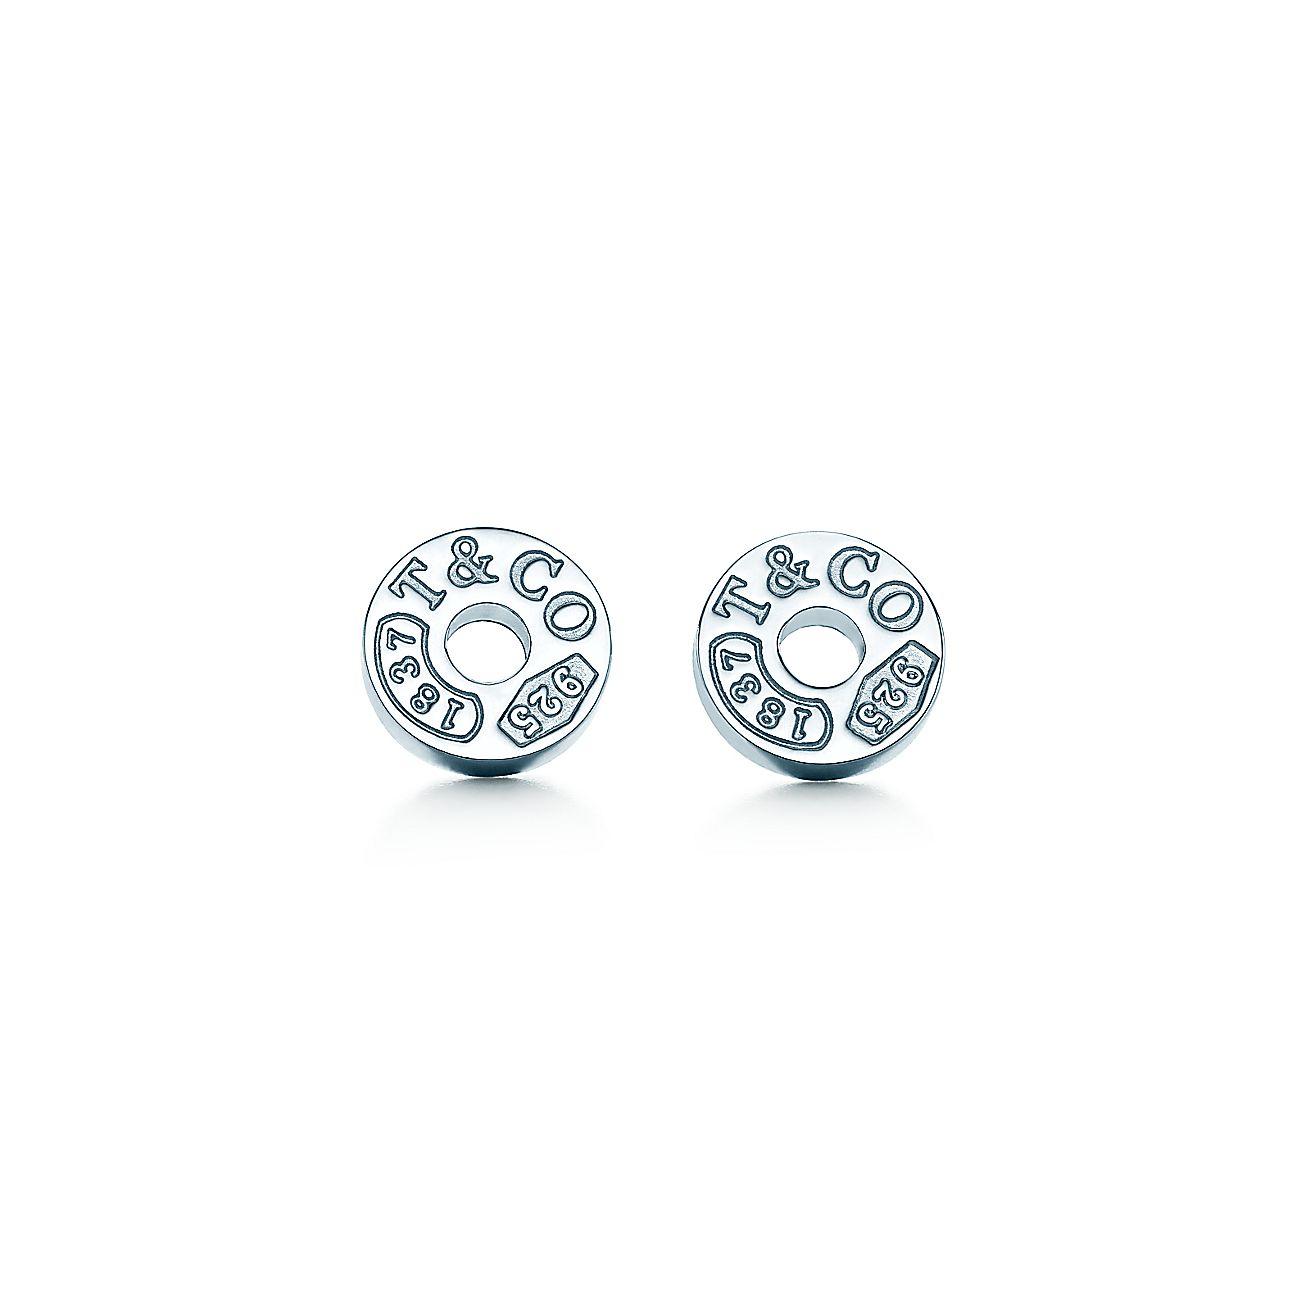 Tiffany 1837 174 Circle Earrings In Sterling Silver